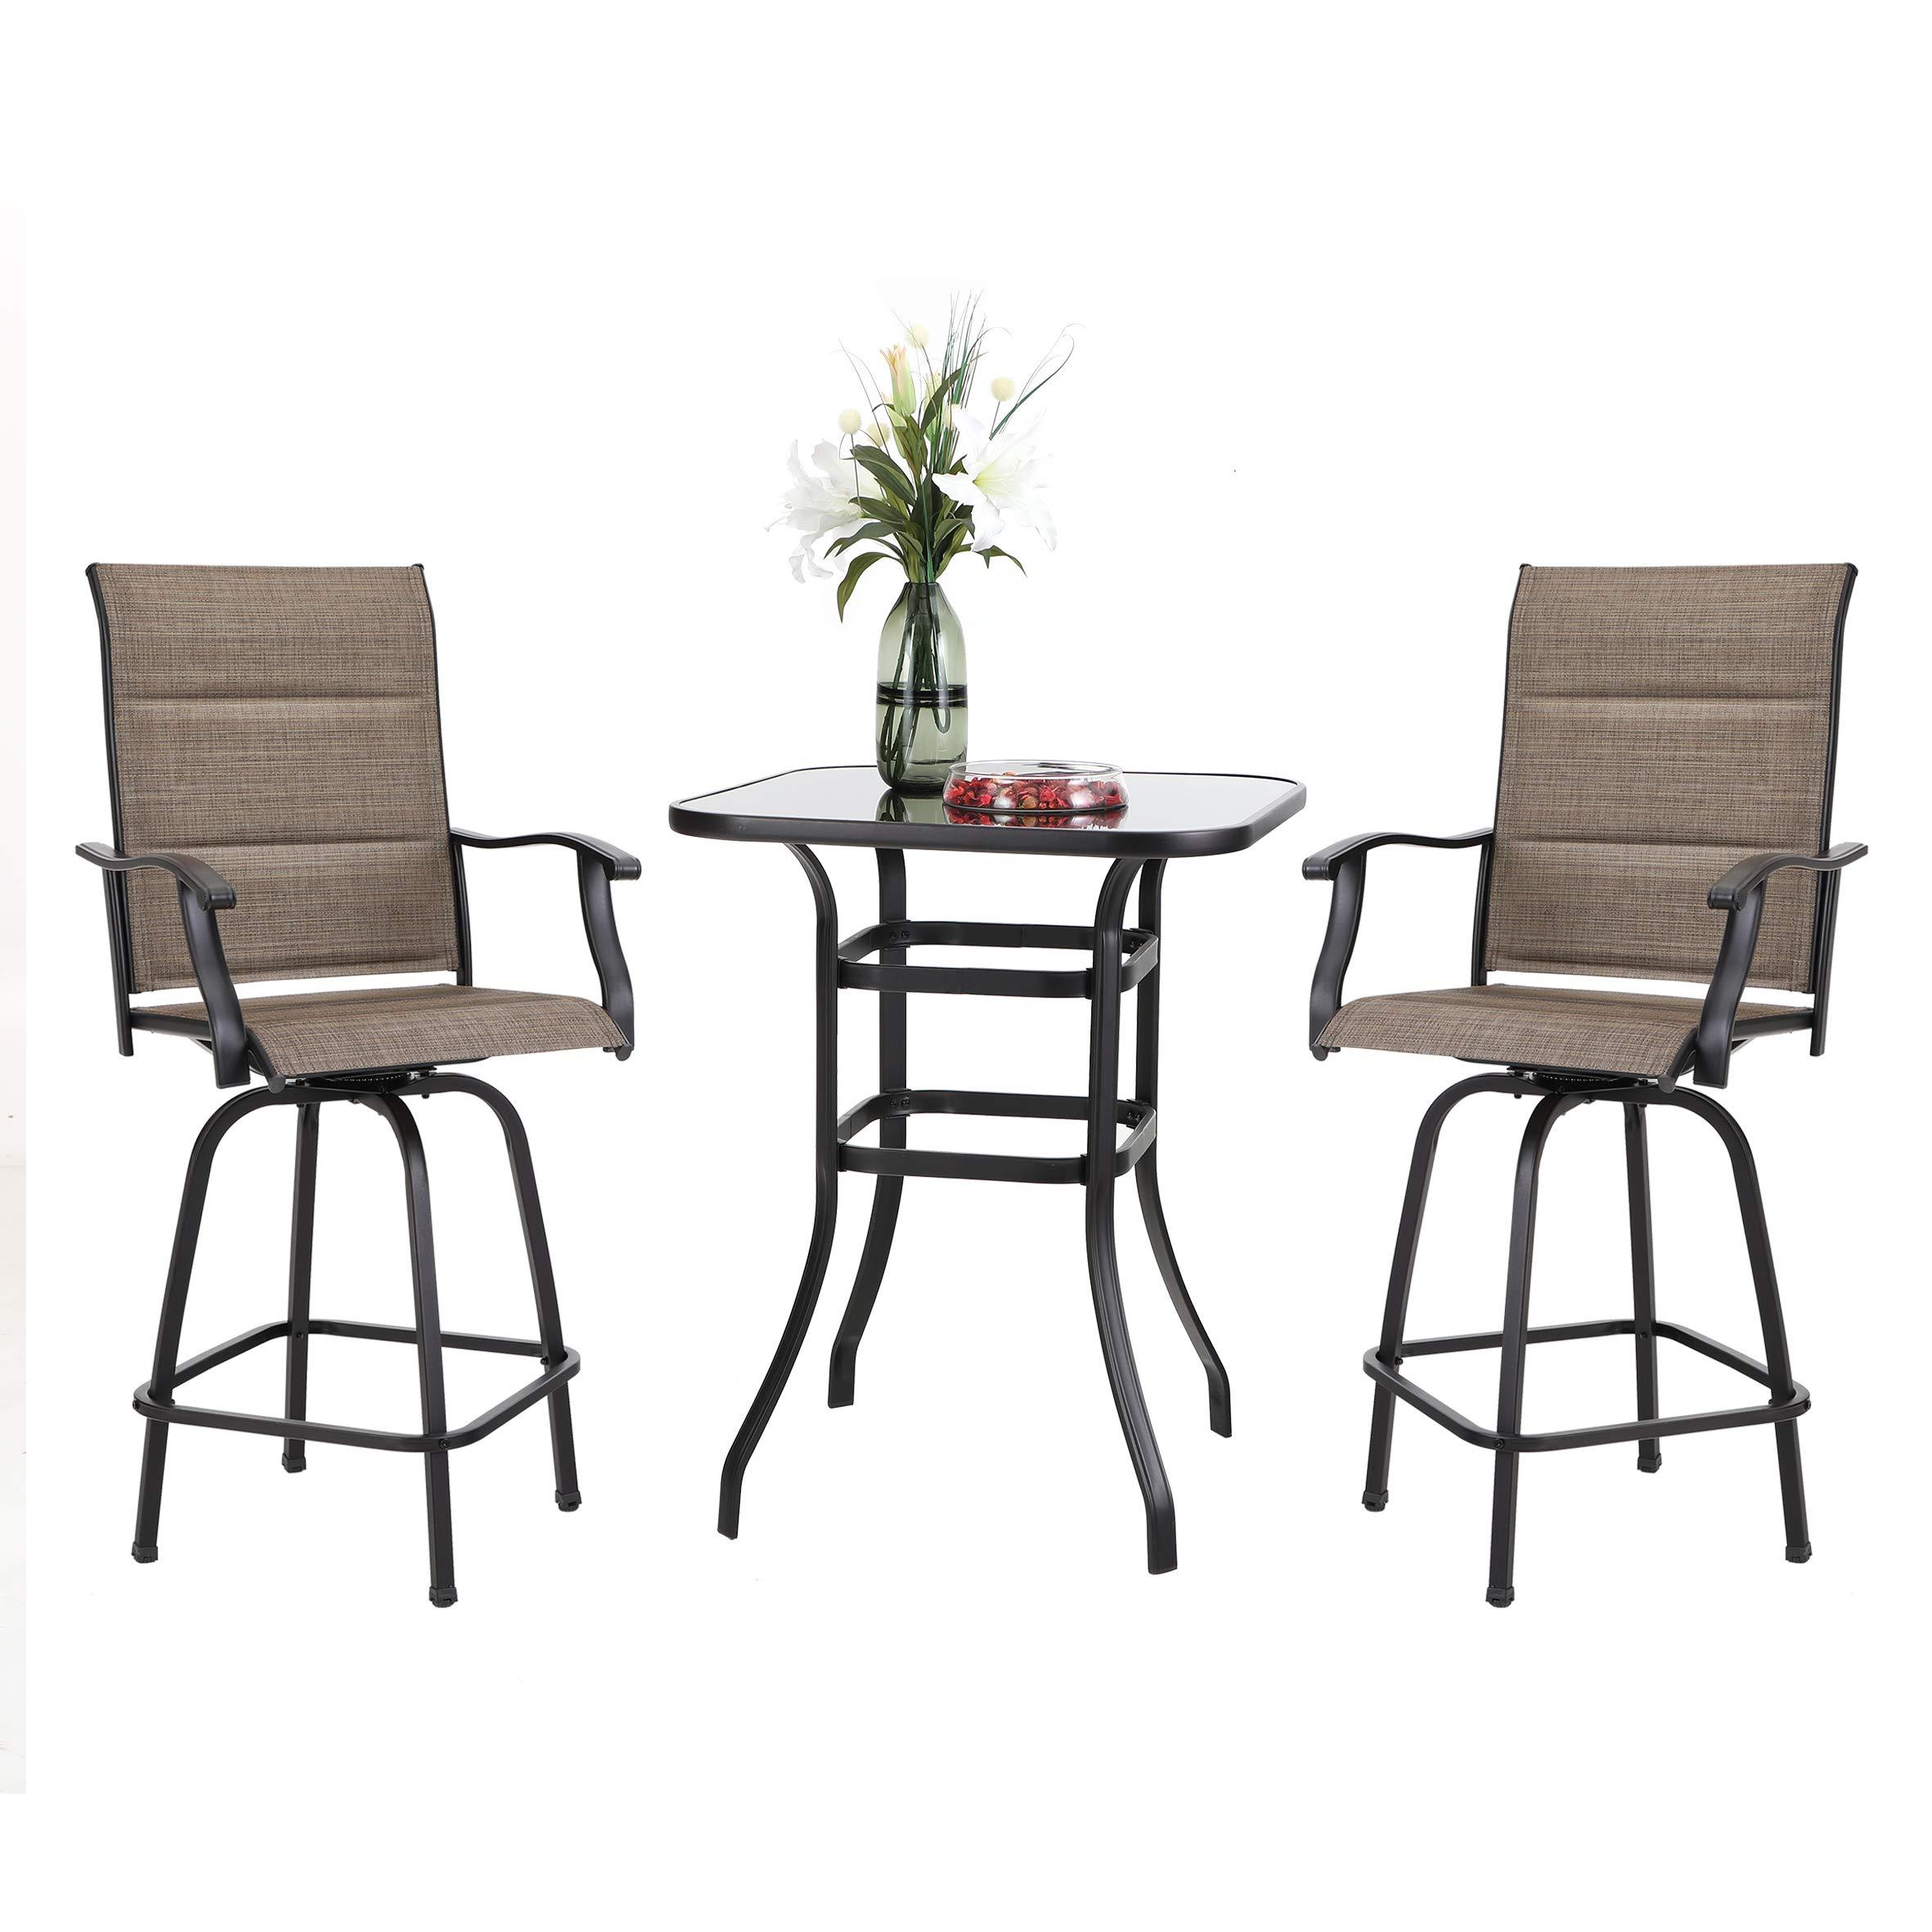 PHI VILLA 3 PCS Patio Swivel Bar Set Outdoor Furniture Bar Height Bistro Set 2 Bar Stools and 1 Table